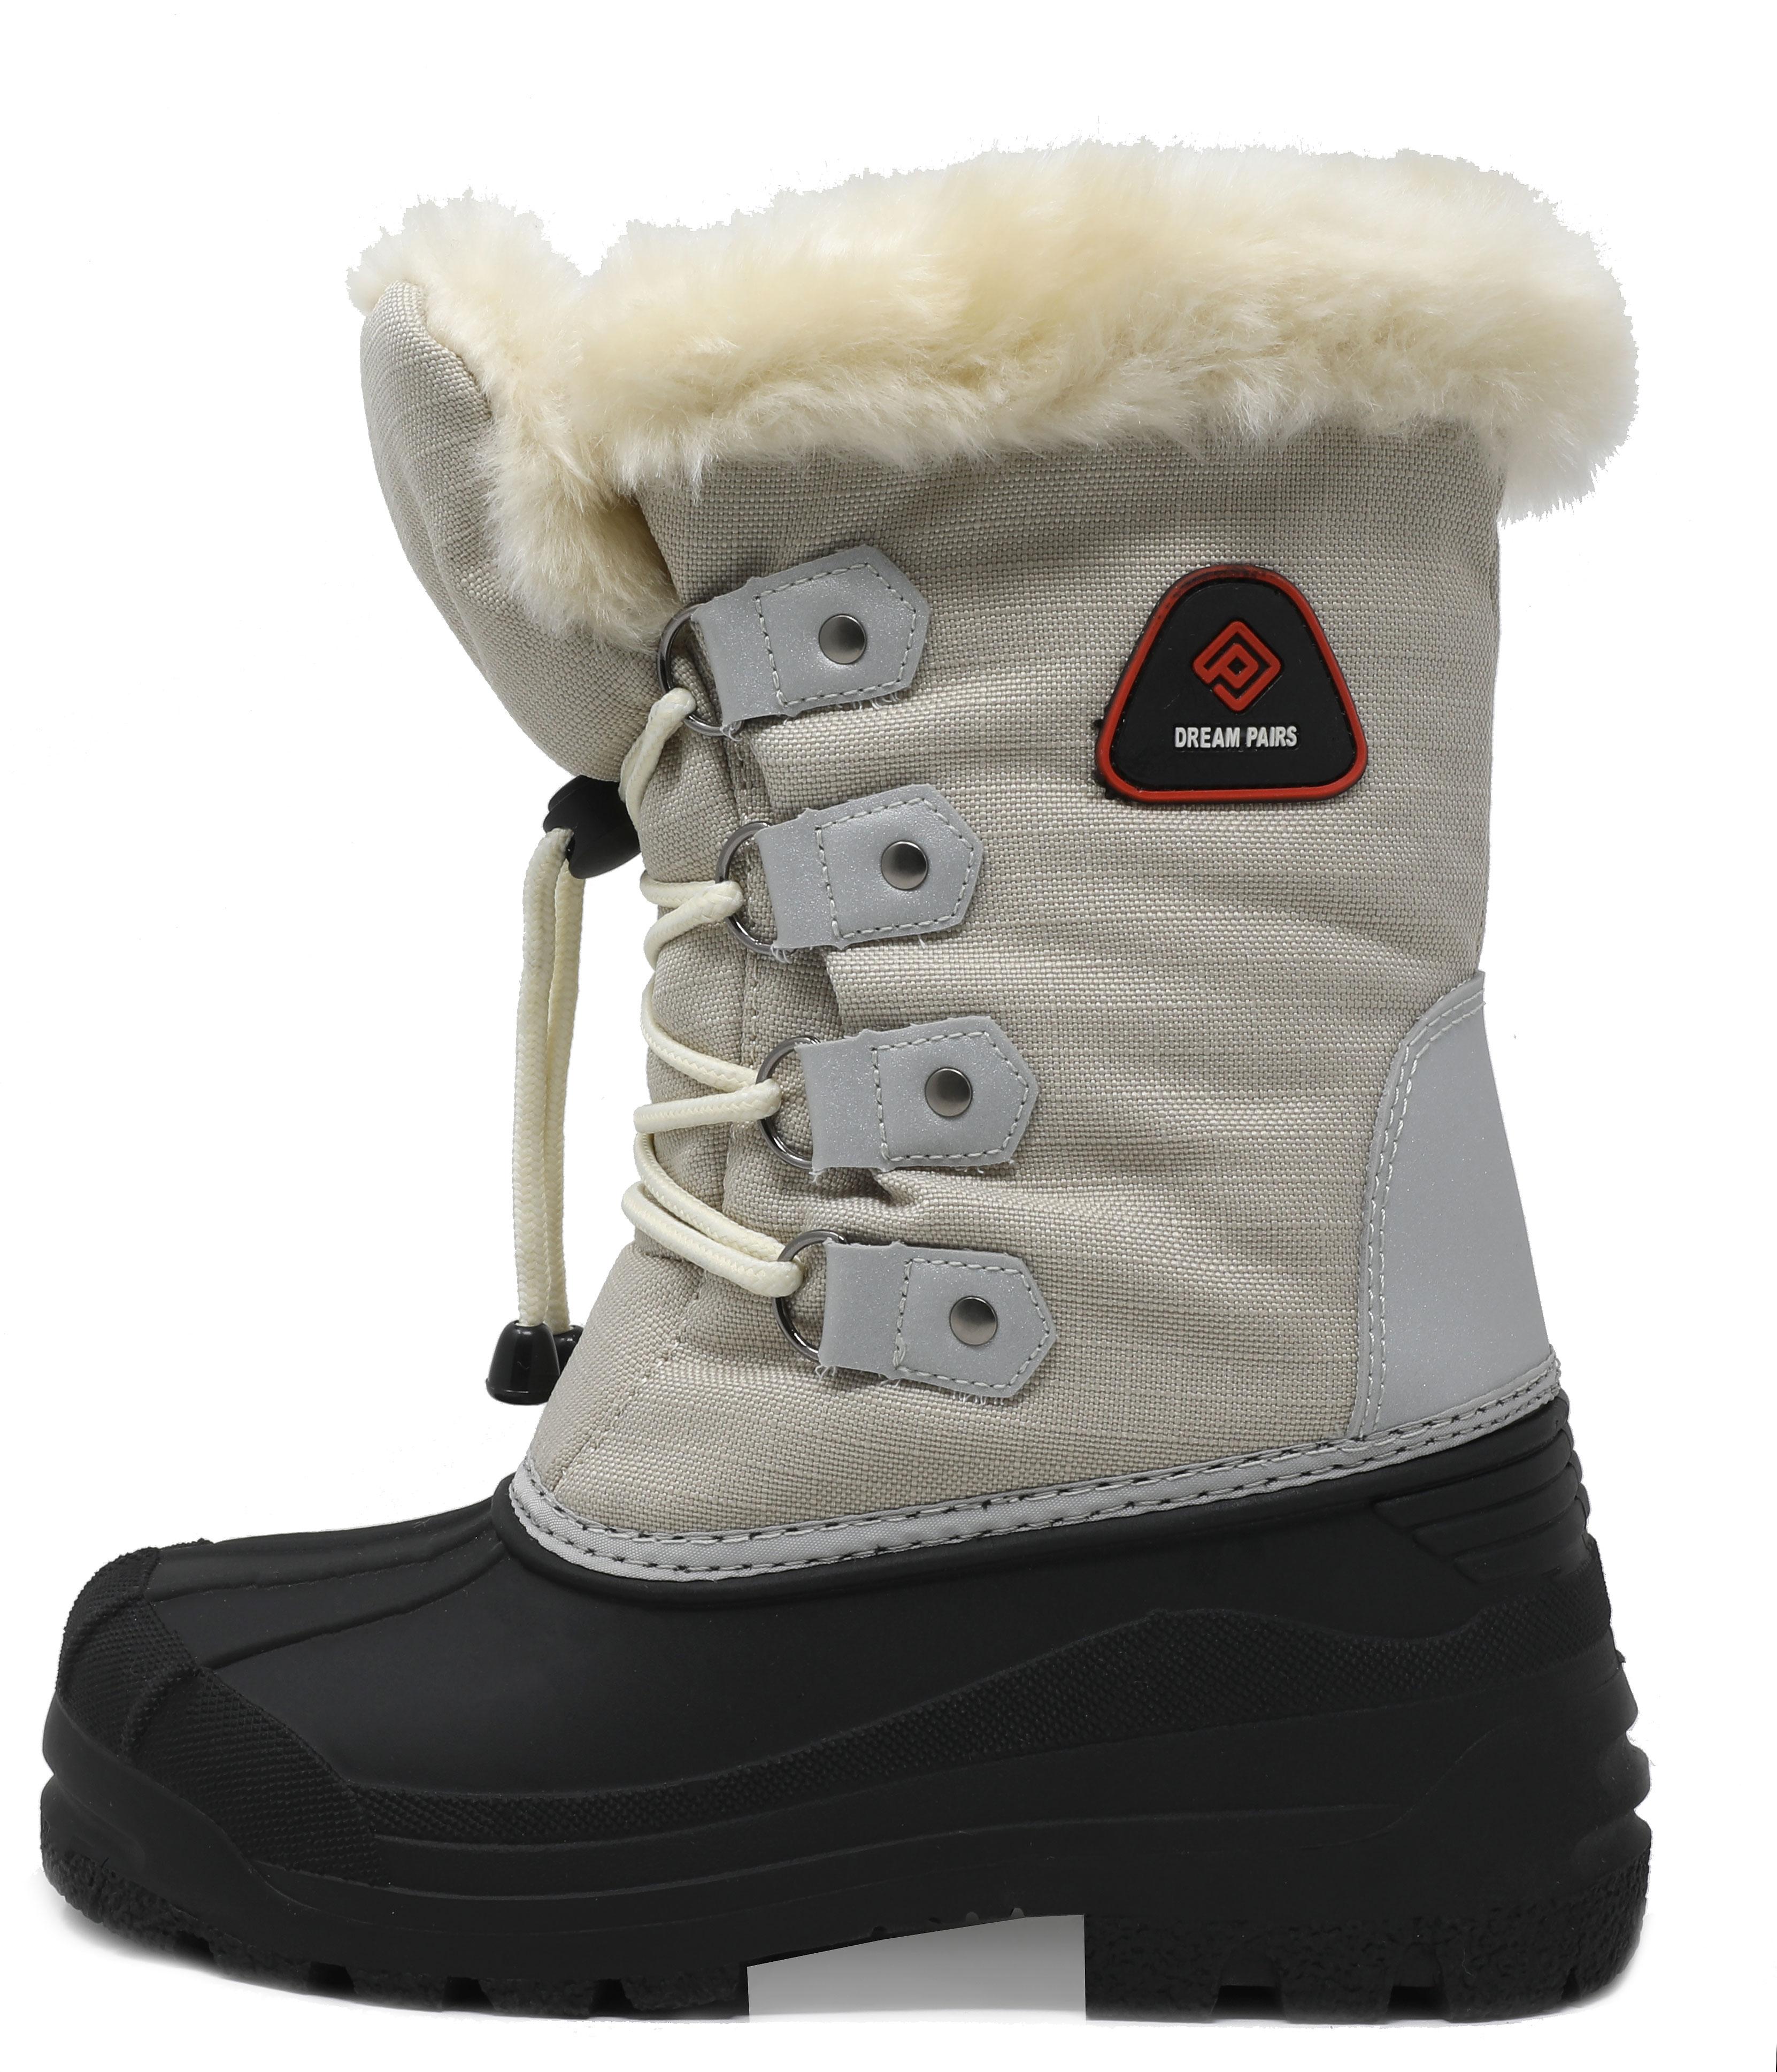 1cc495d37ece DREAM PAIRS Boys   Girls Toddler  Kid Insulated Fur Winter ...